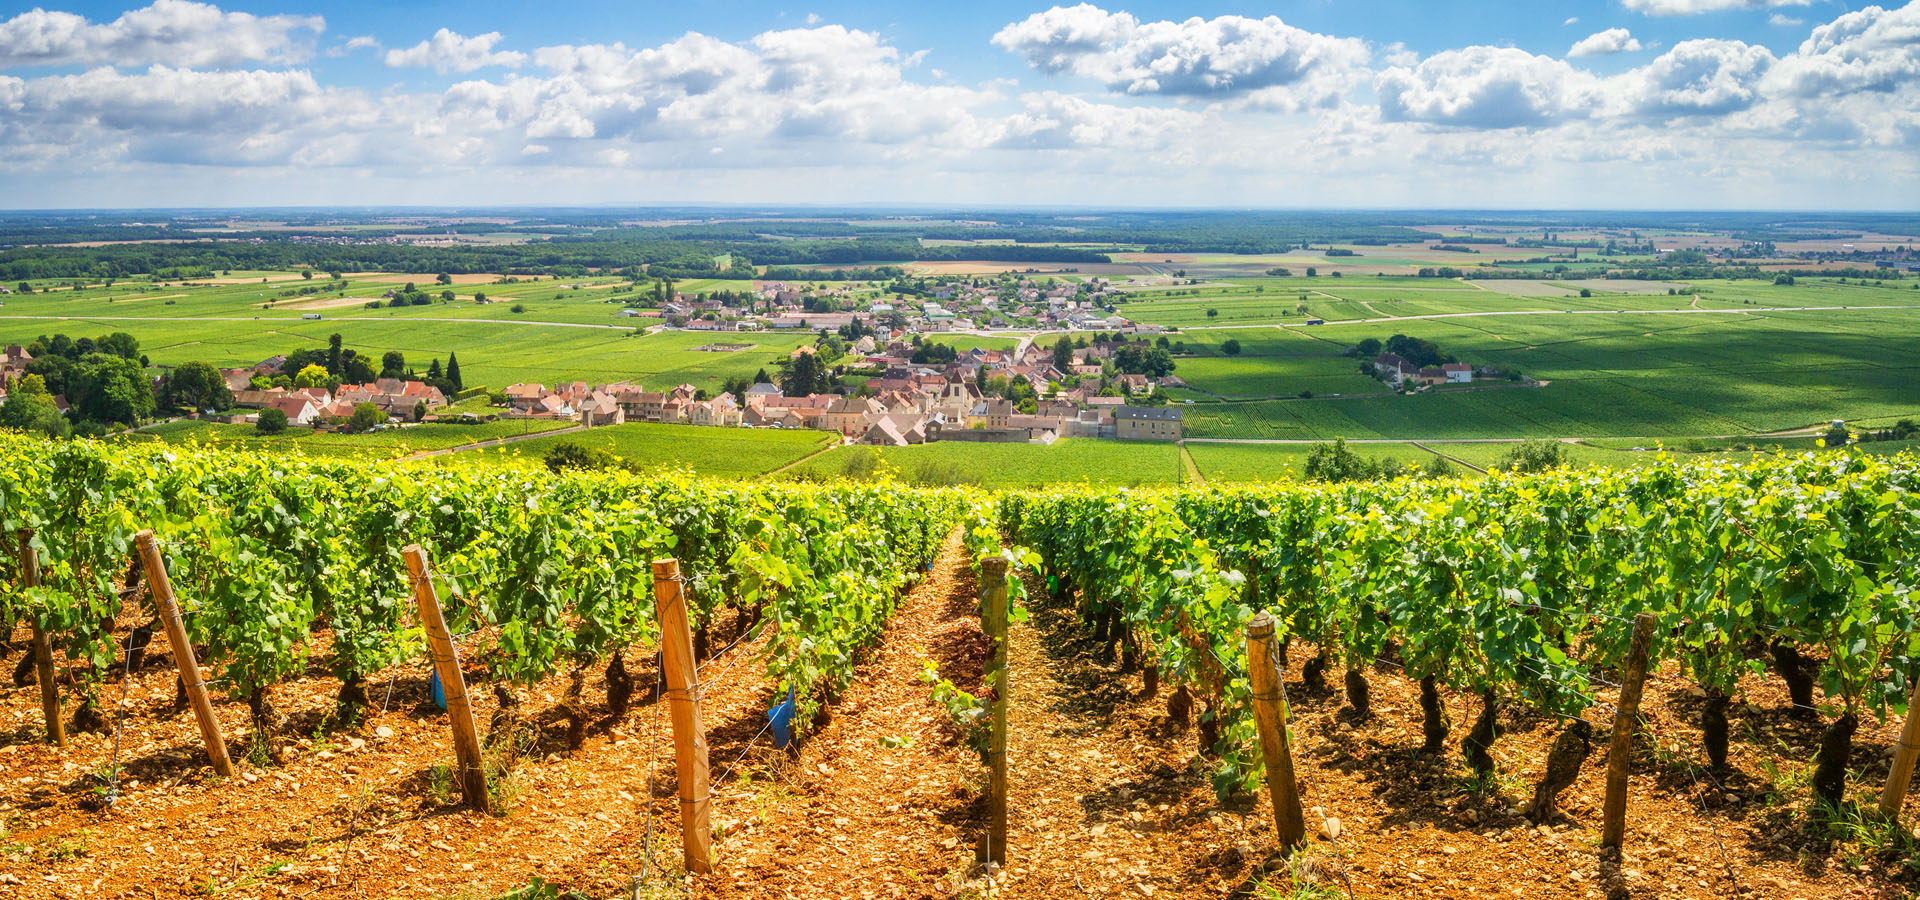 vignoble de la vallee du rhone